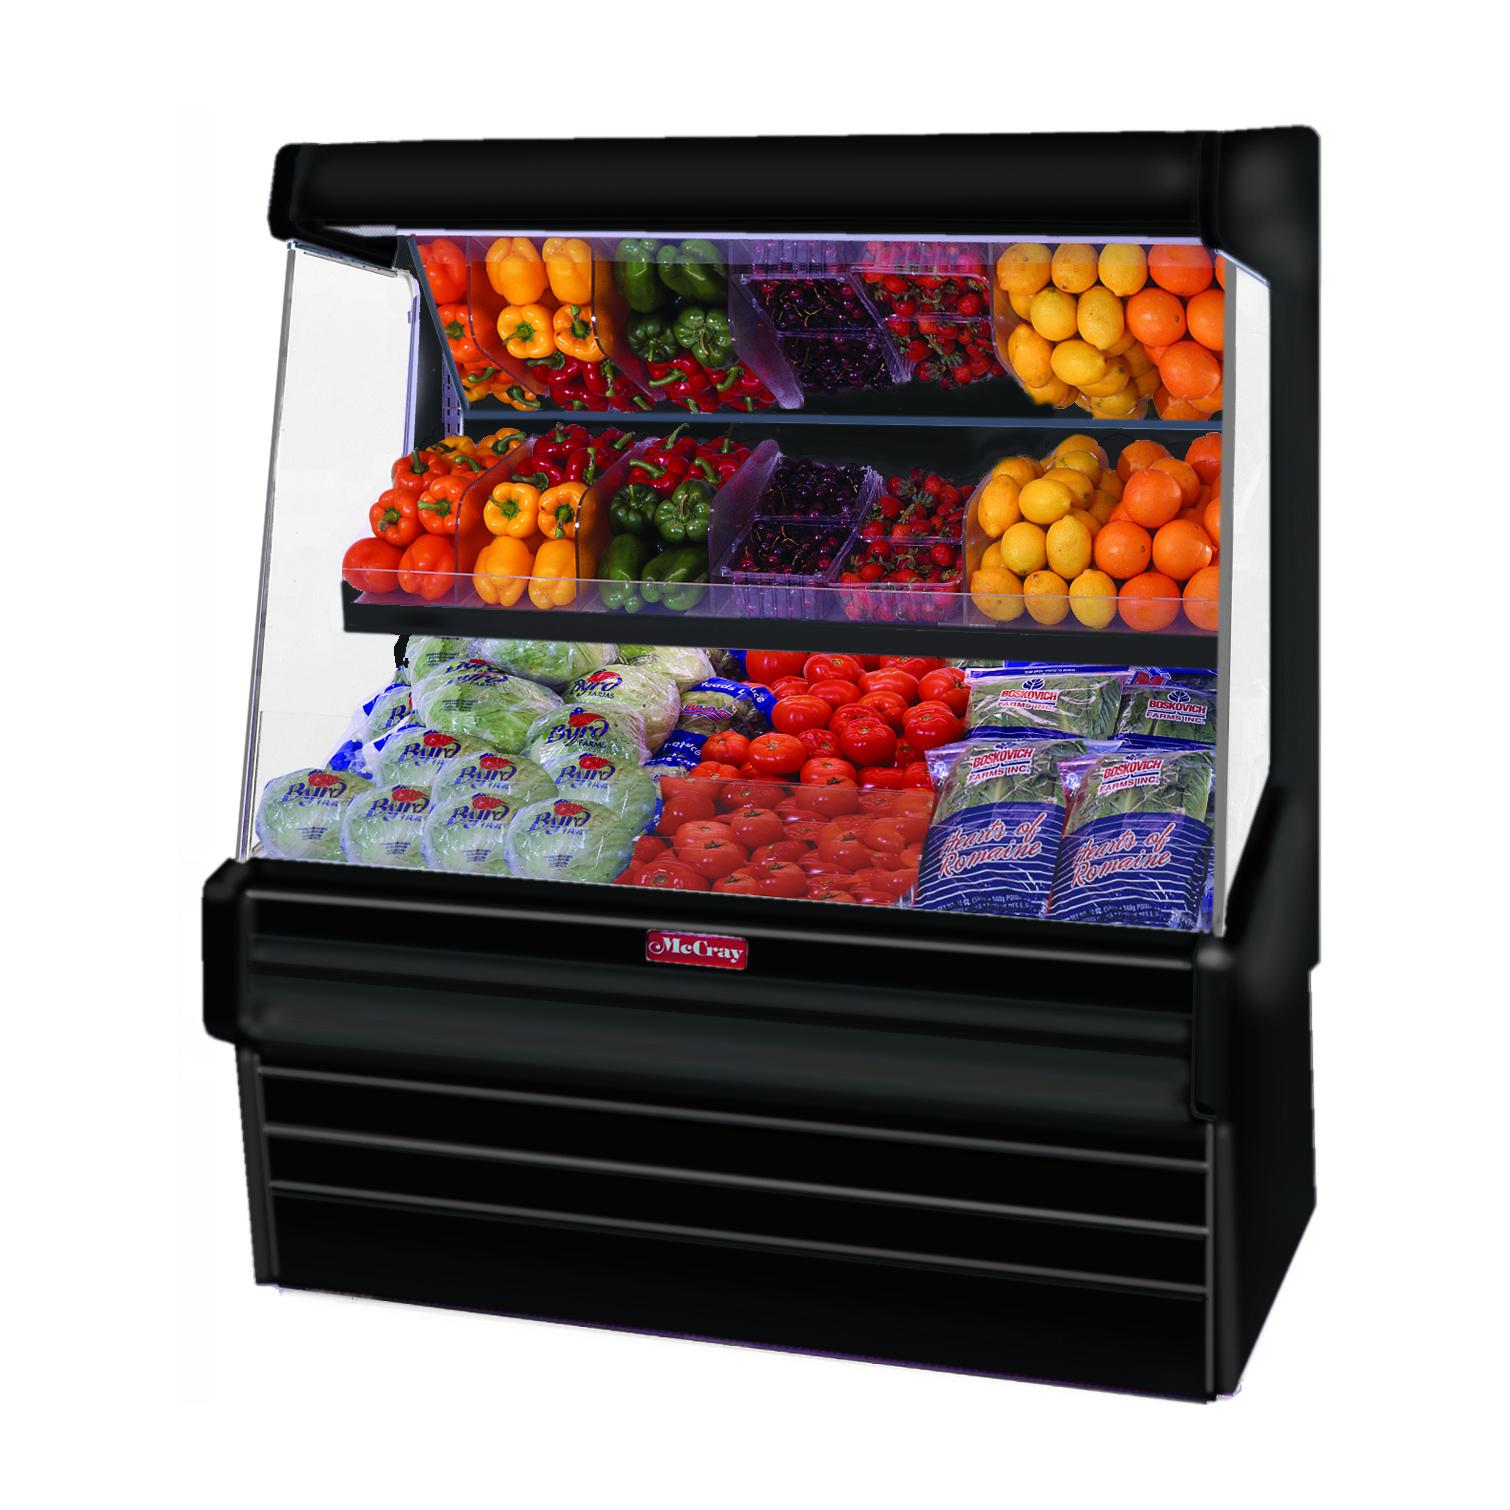 Howard-McCray SC-OP30E-5L-B-LED display case, produce